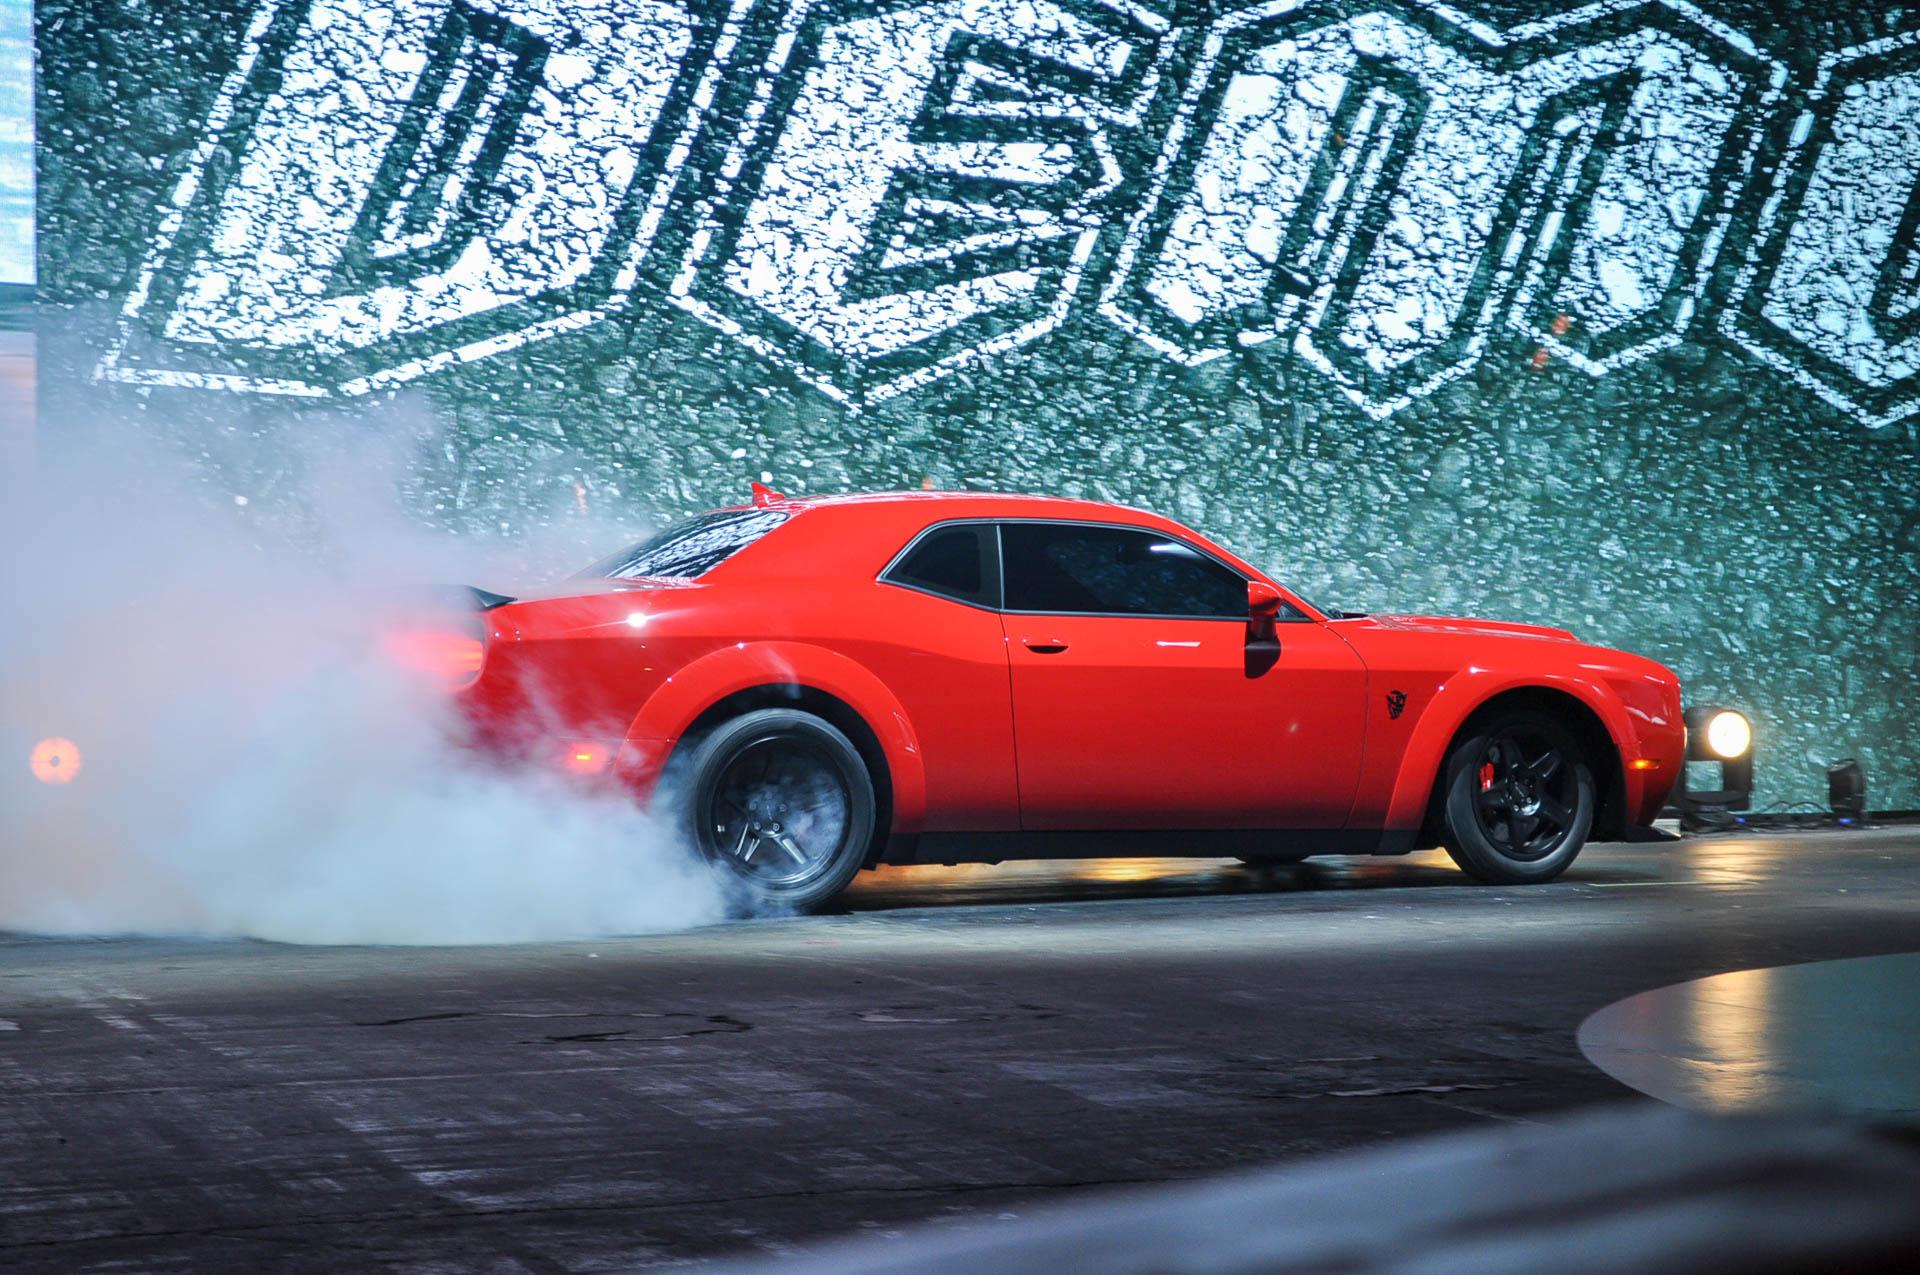 2018 Dodge Demon delivers 840 horsepower, does 0-60 in 2.3 ...